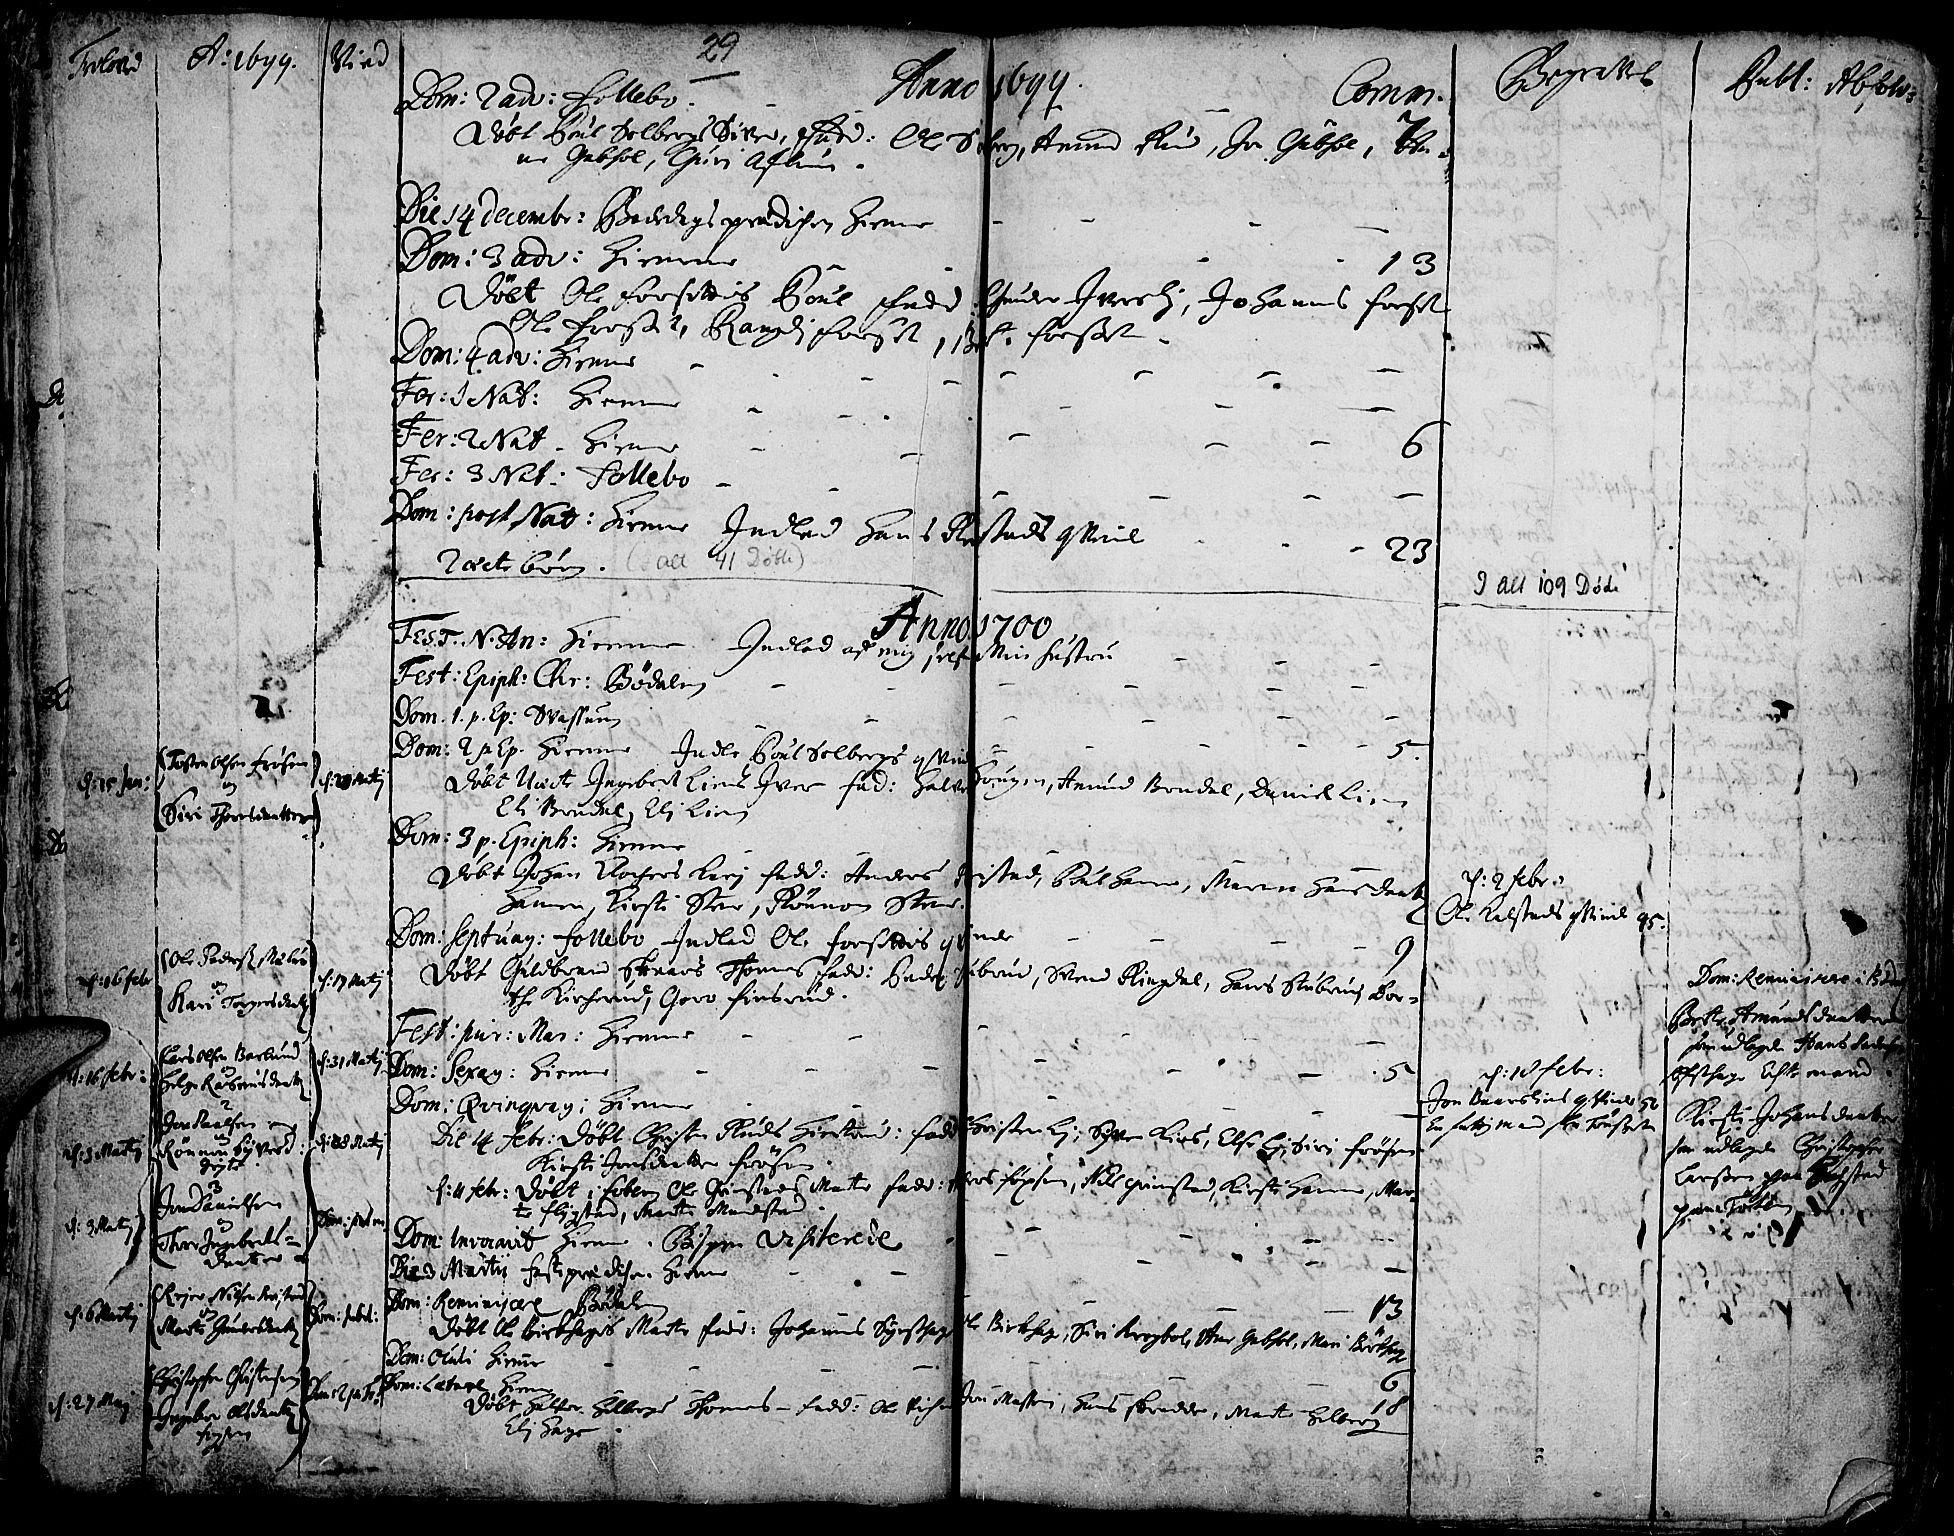 SAH, Gausdal prestekontor, Ministerialbok nr. 1, 1693-1728, s. 29